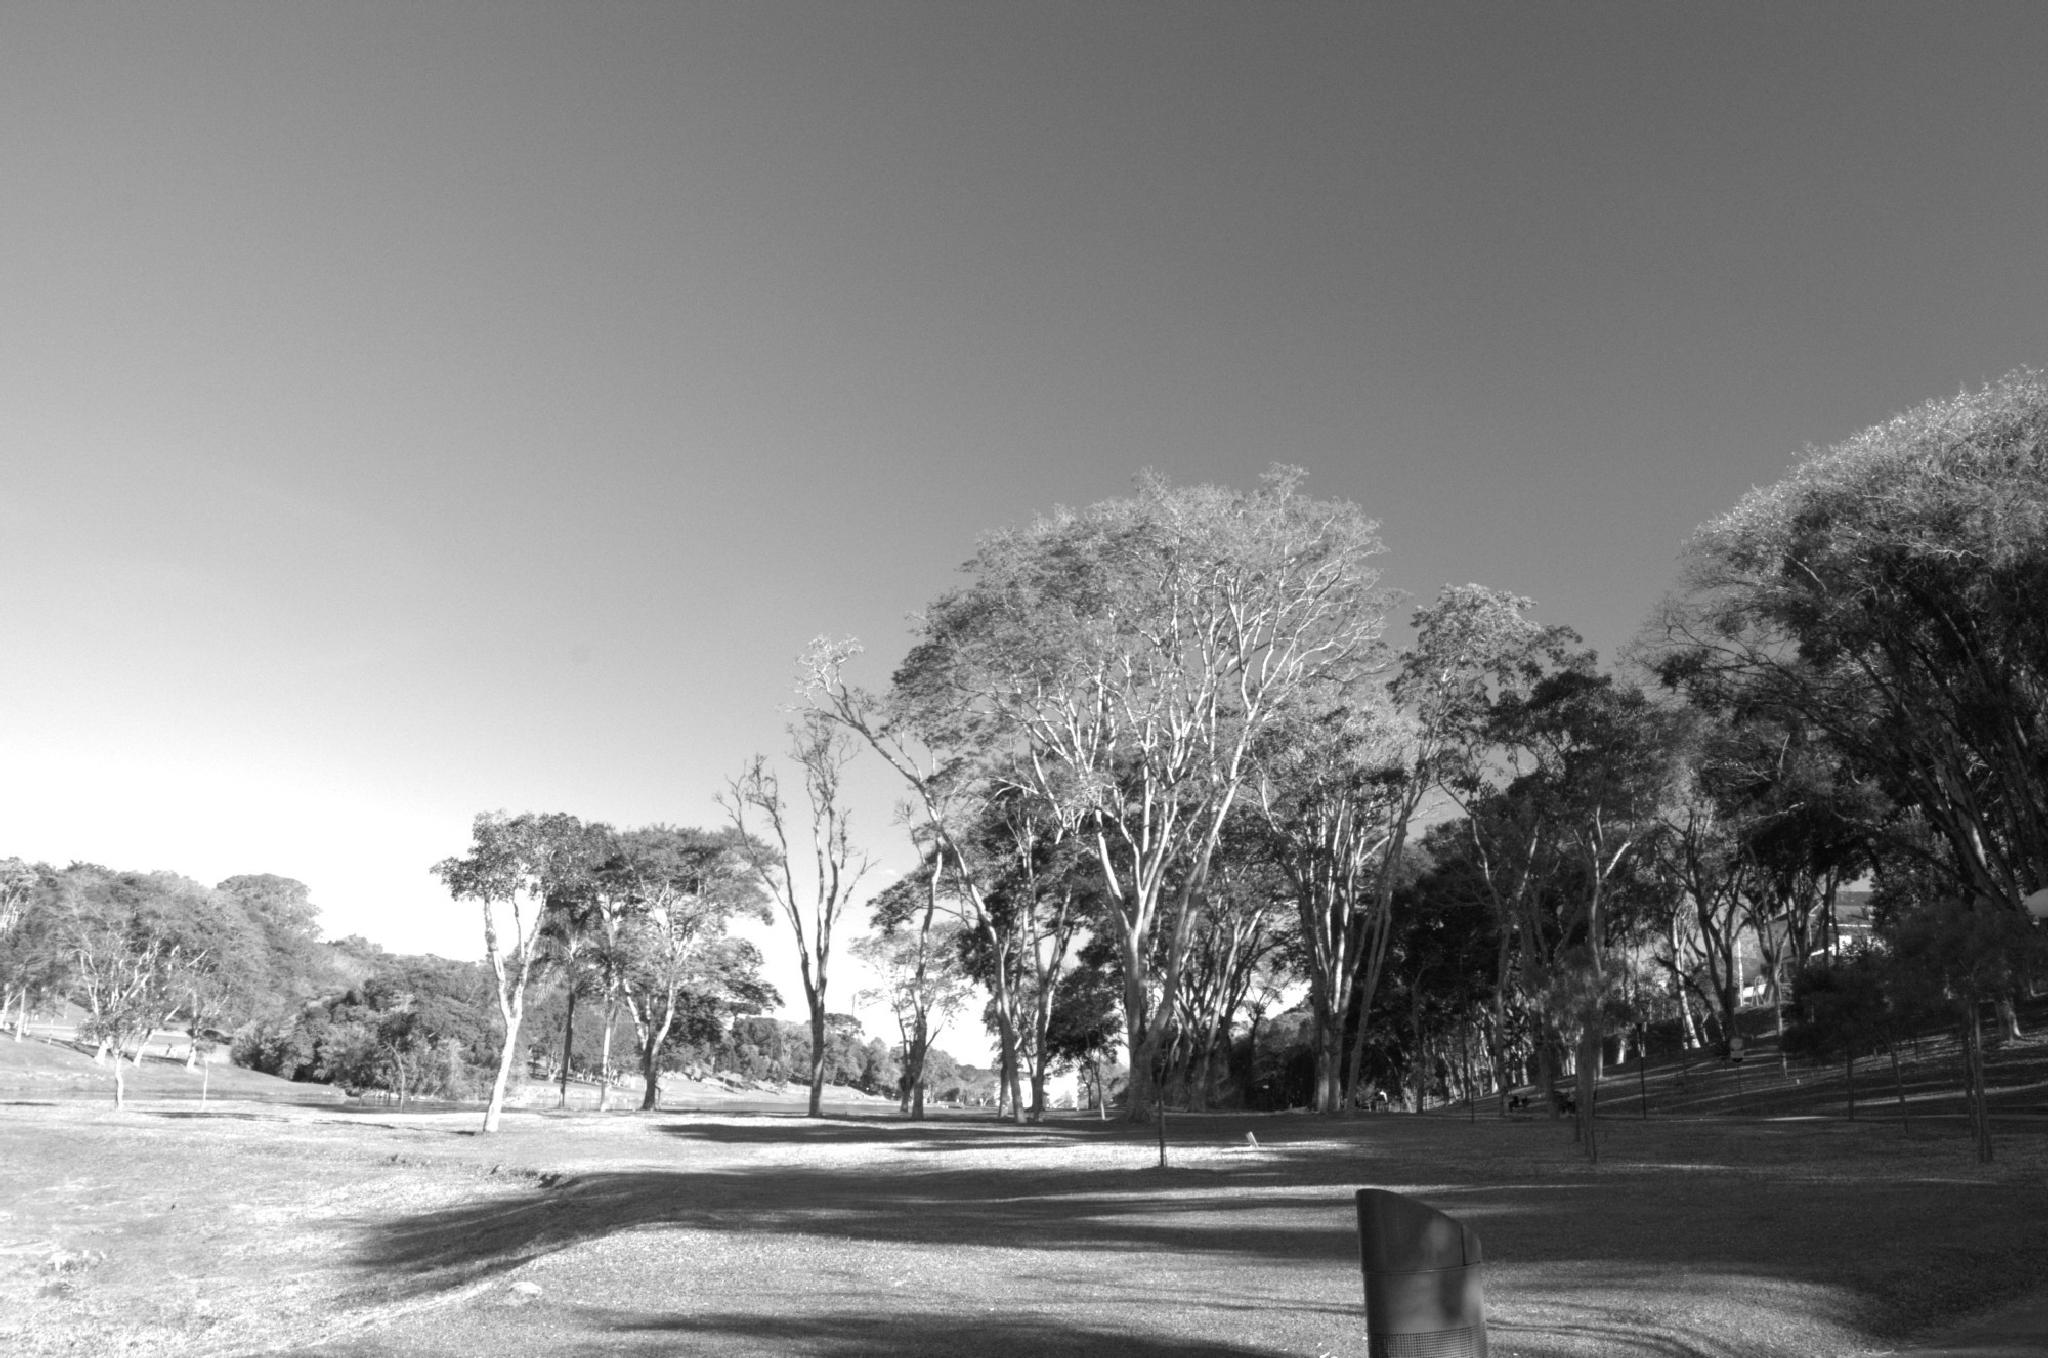 Sao Lourenco park by Thiago Alessandre